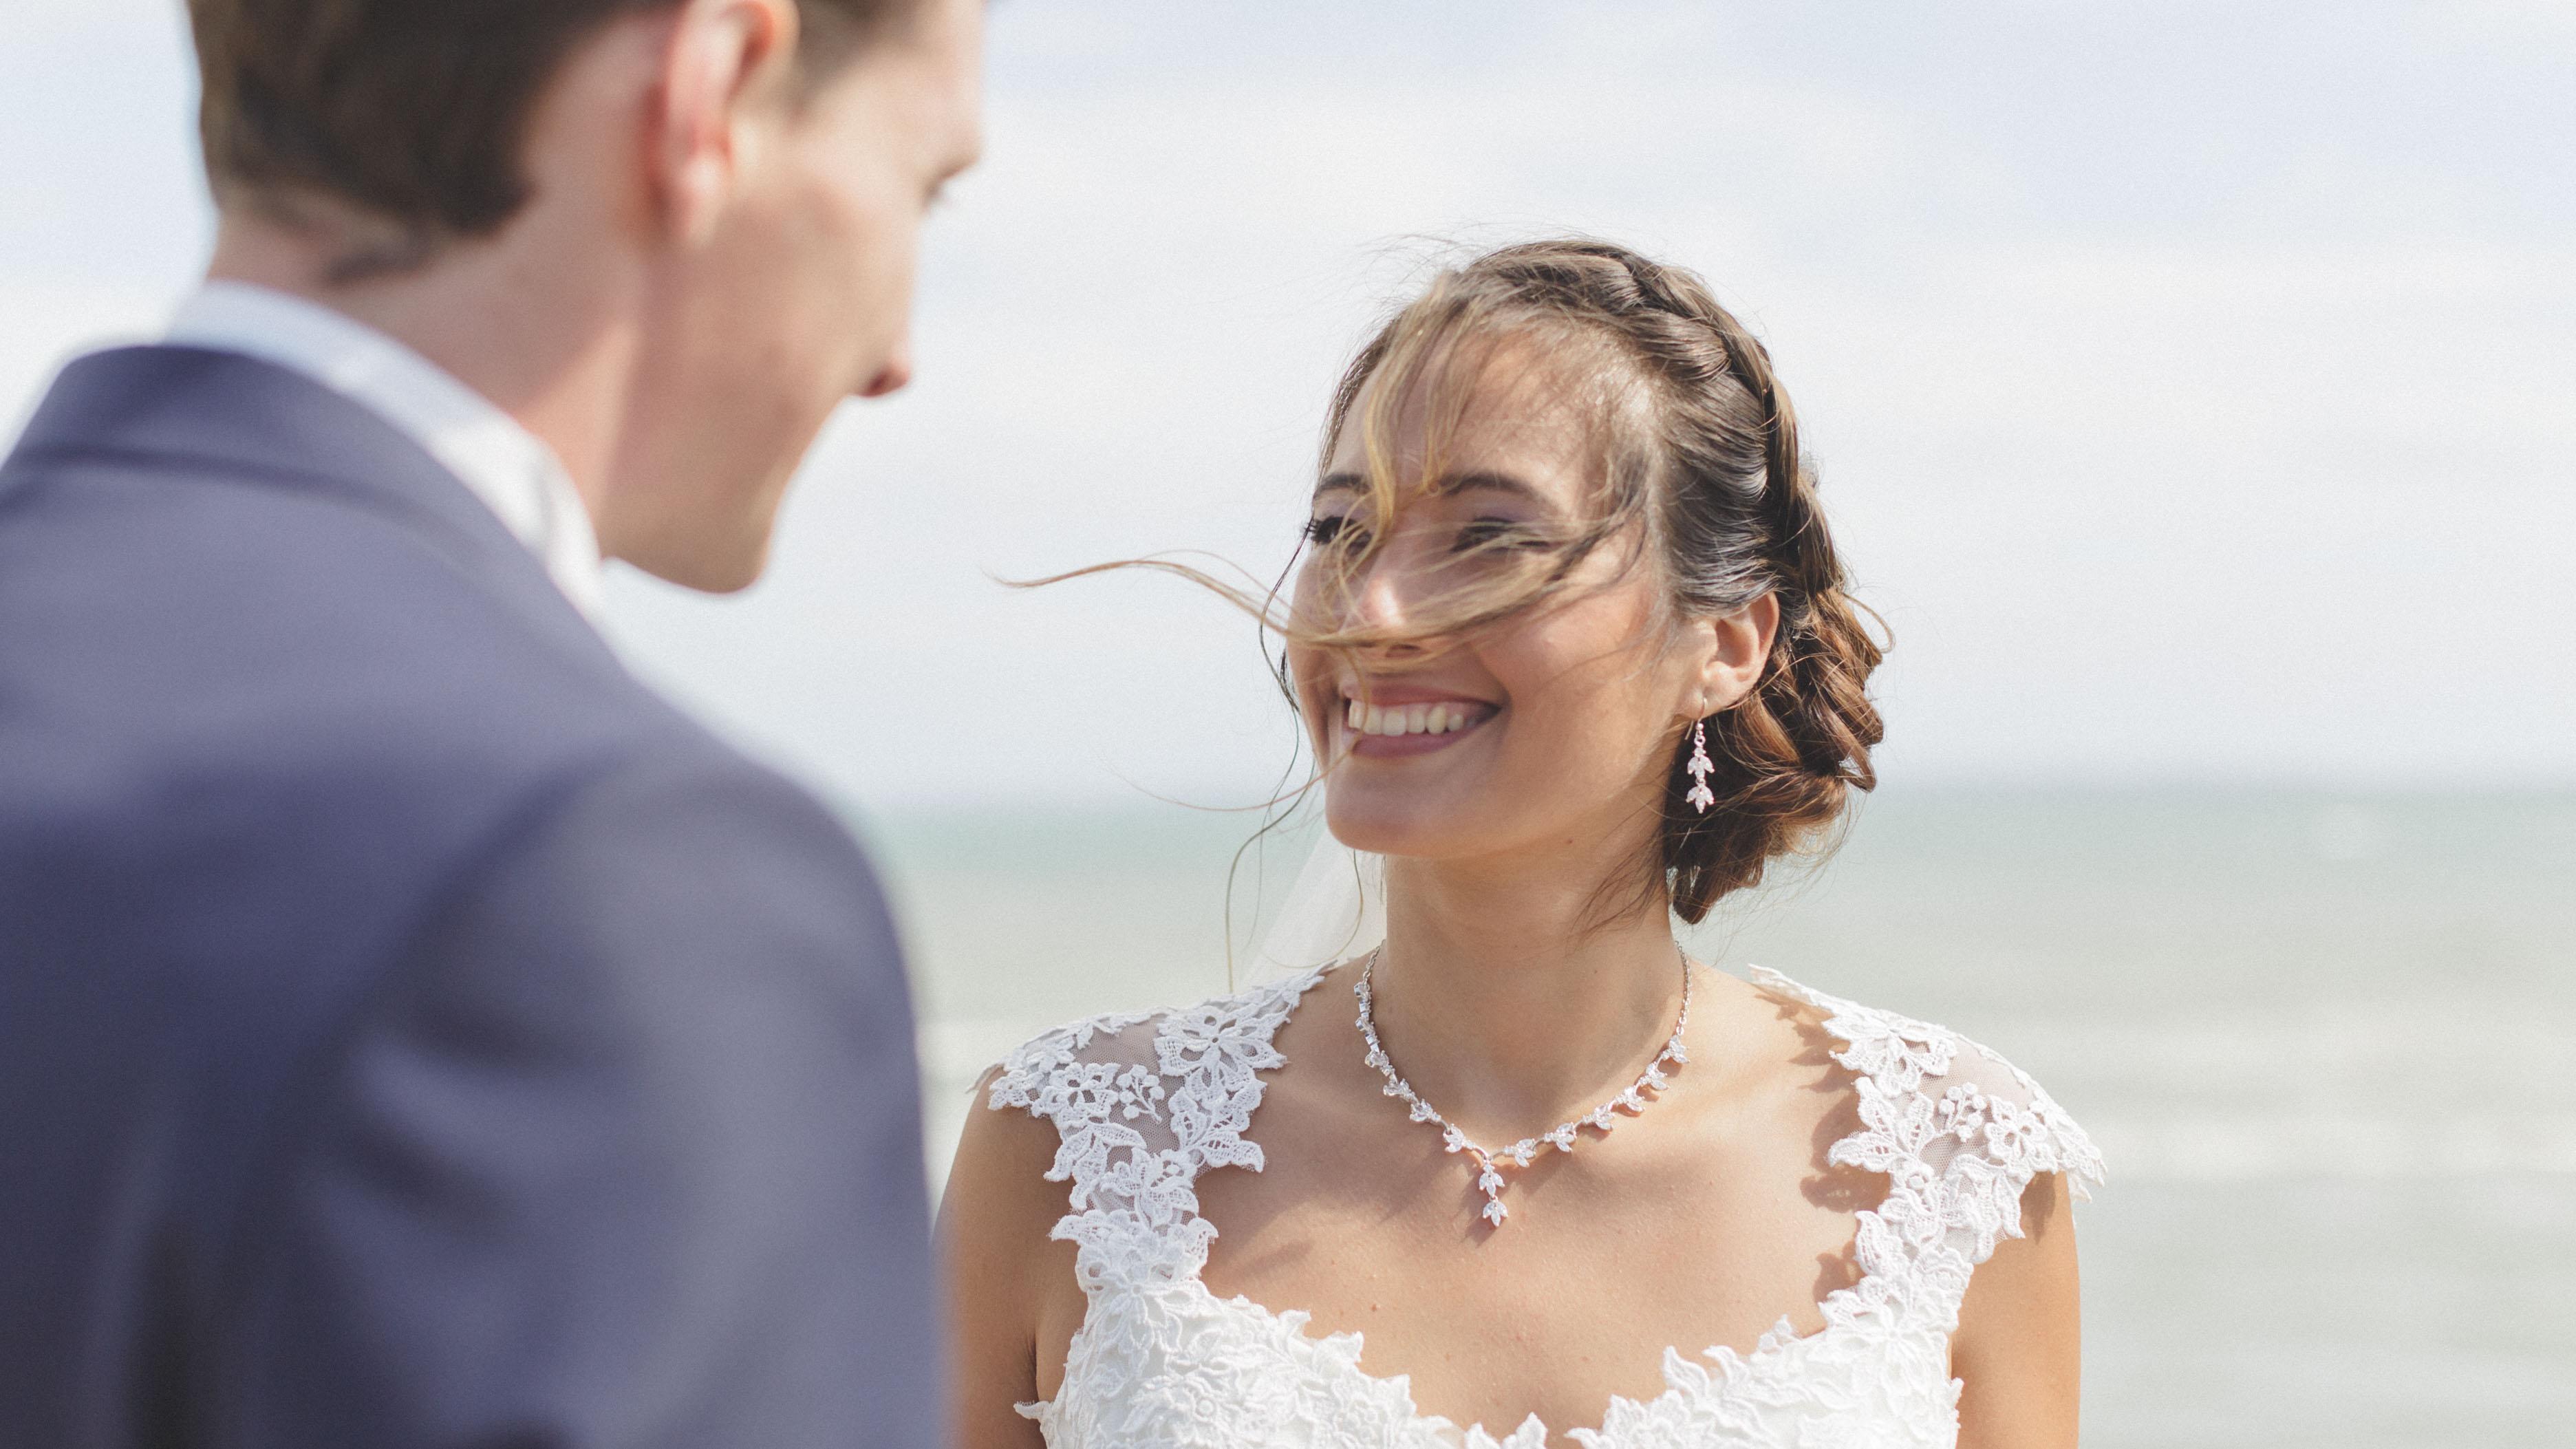 Photographie - Mariage - Bretagne - Finistere - Morbihan - Lilian Vezin Photographie (28)